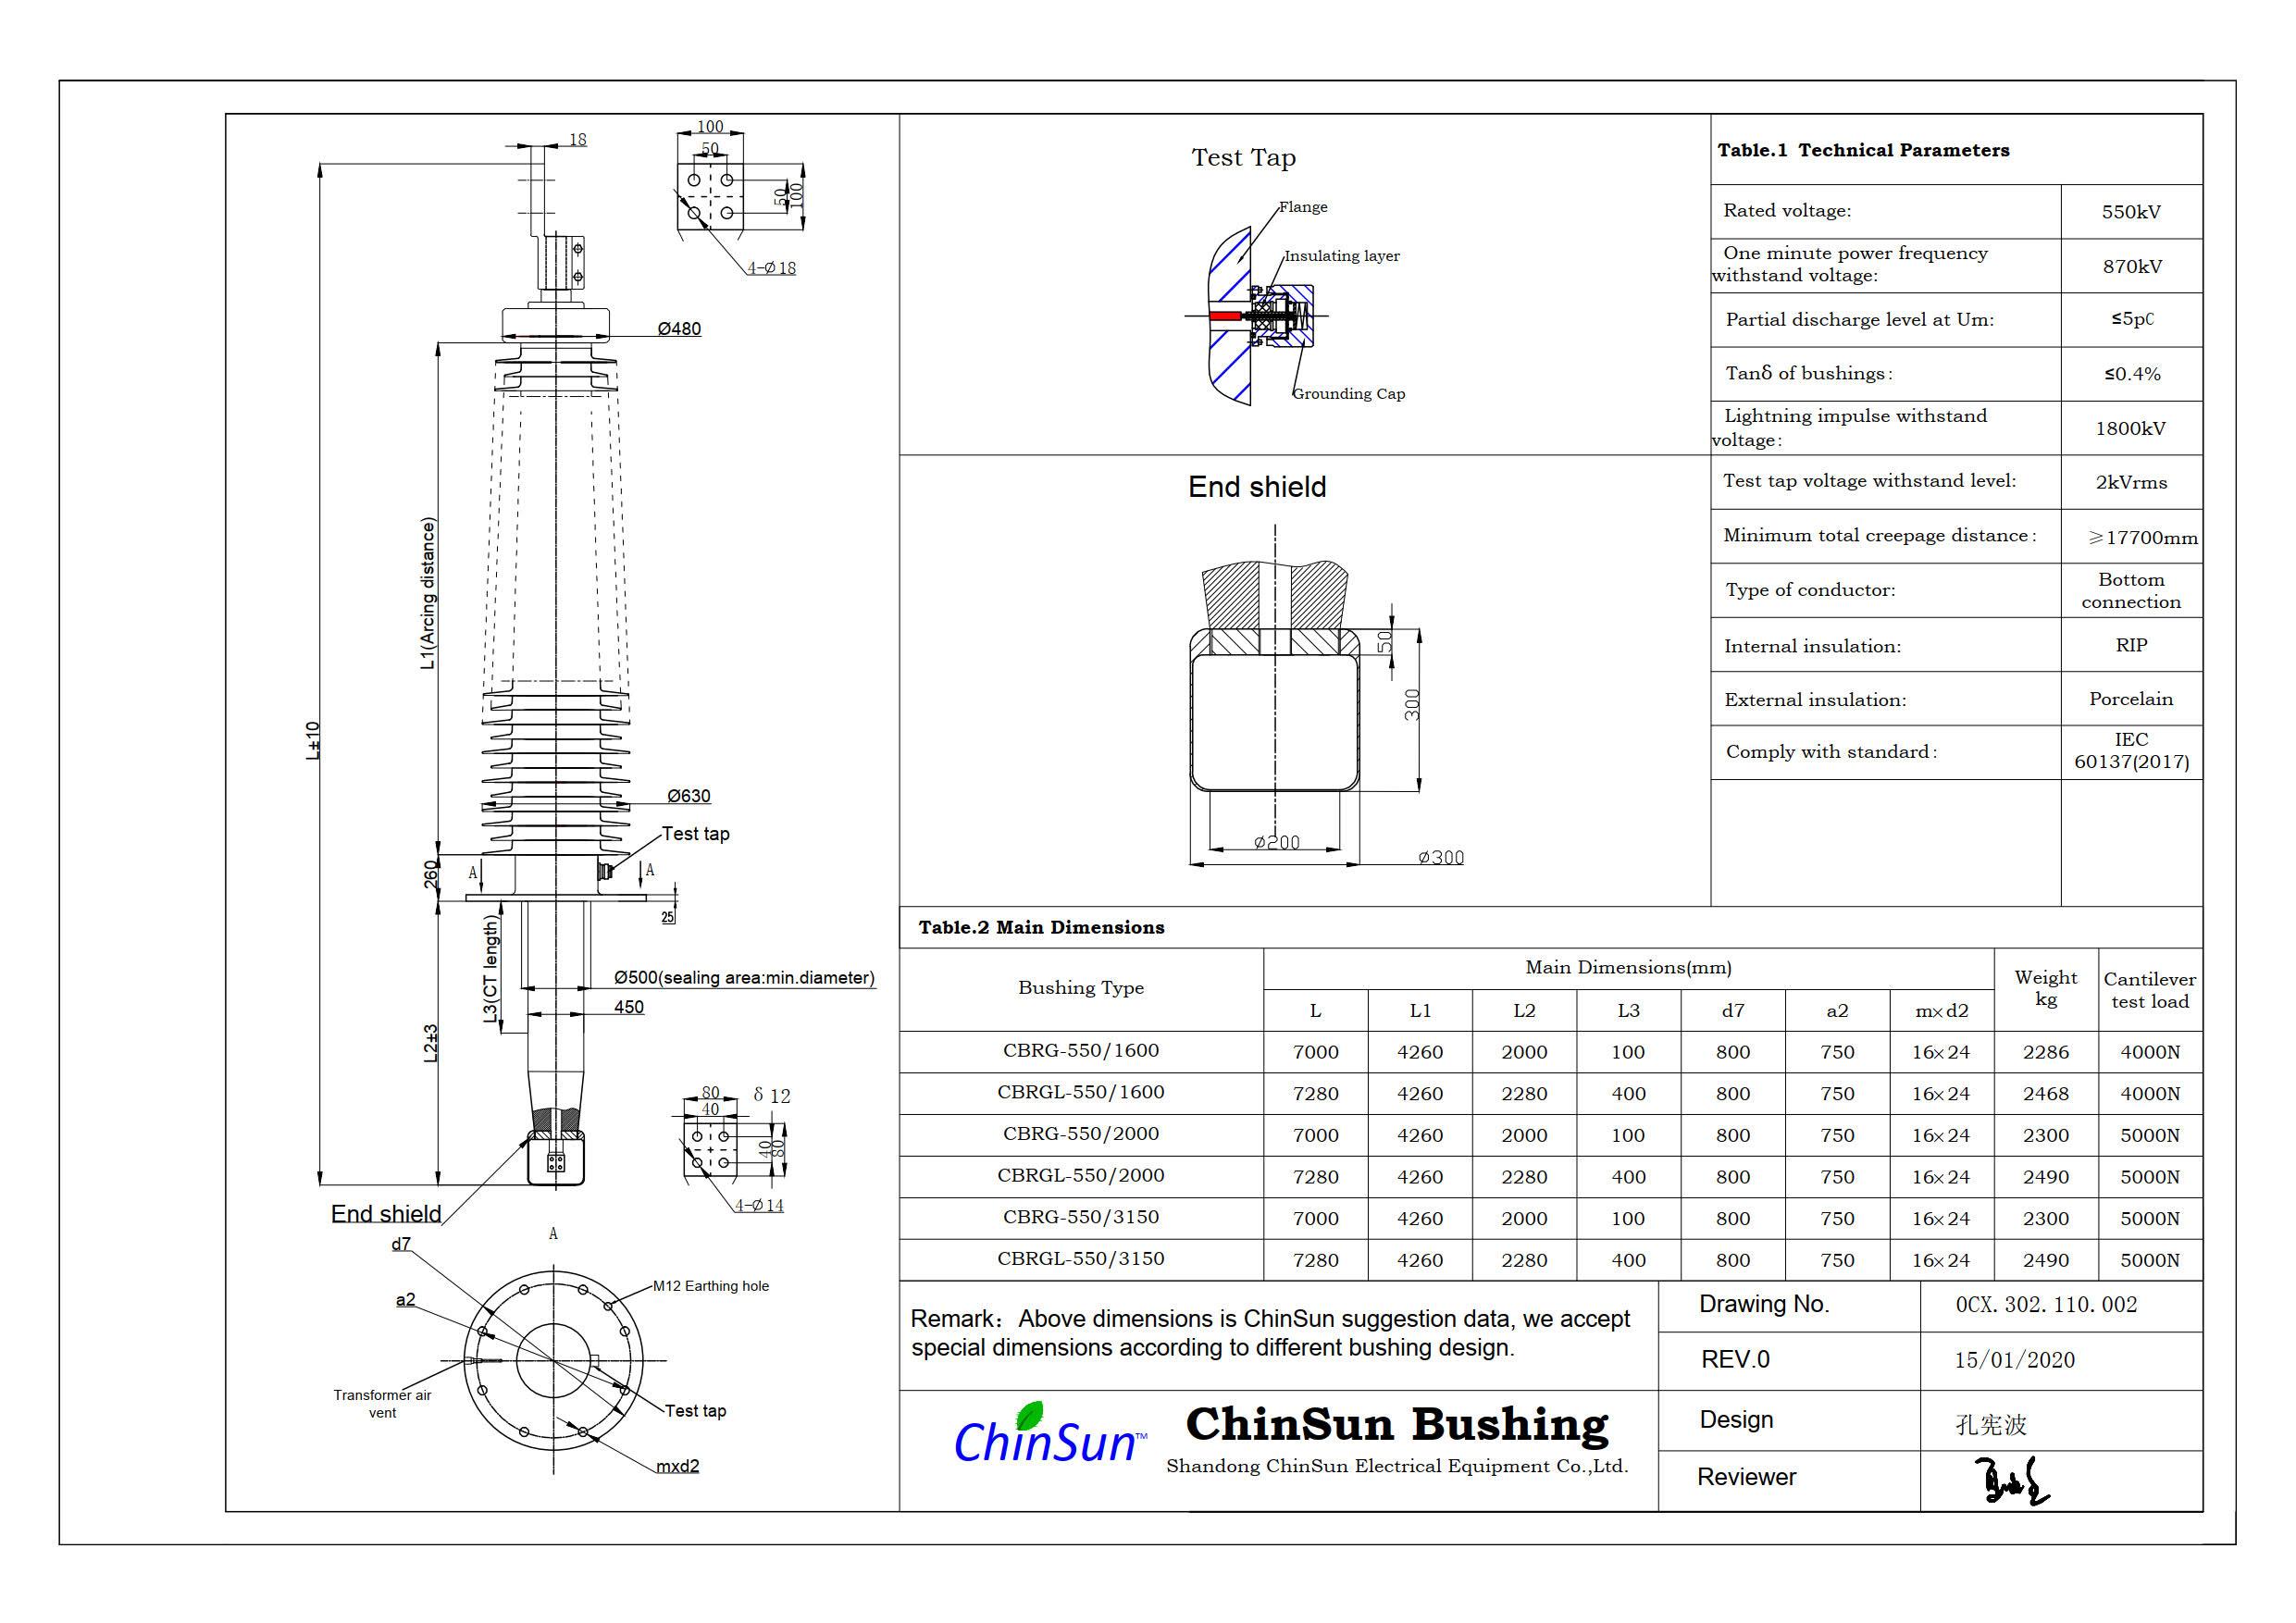 Drawing-transformer bushing-550kV porcelain-BC-ChinSun